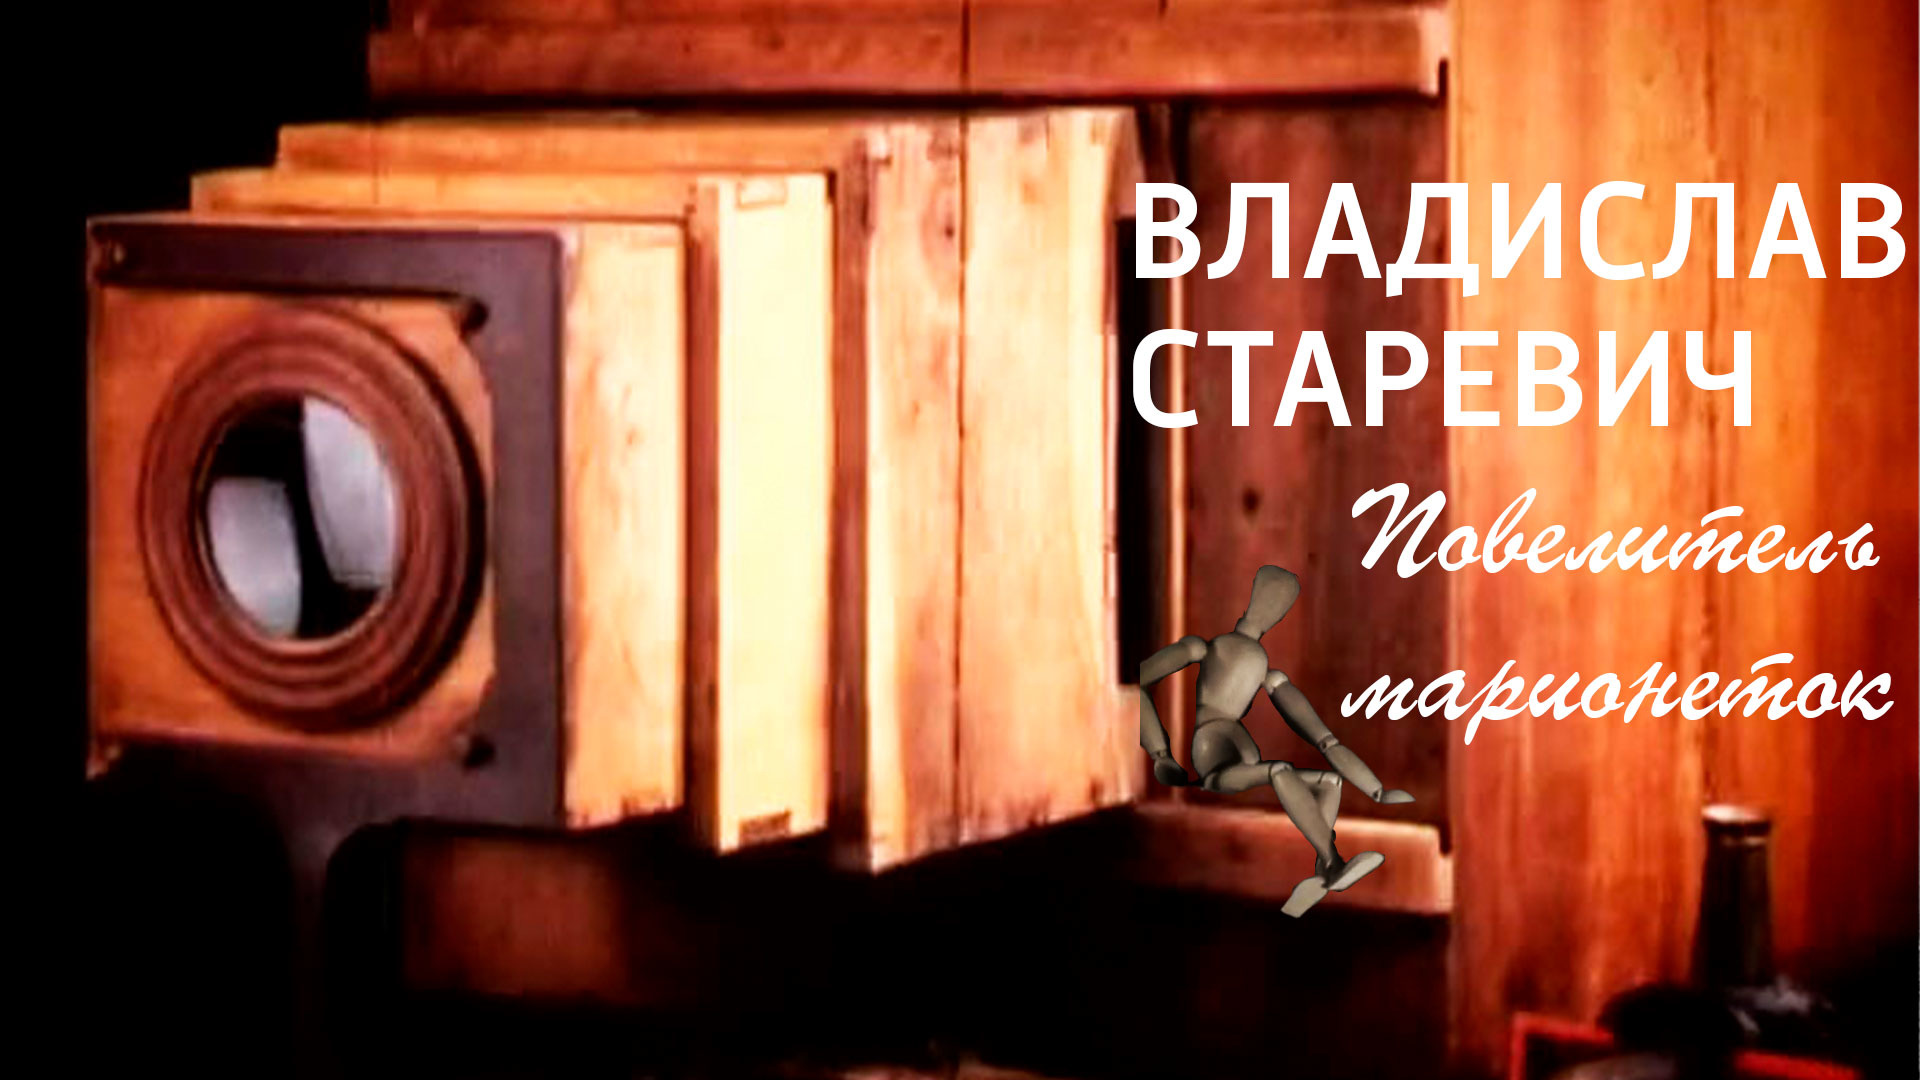 Владислав Старевич. Повелитель марионеток